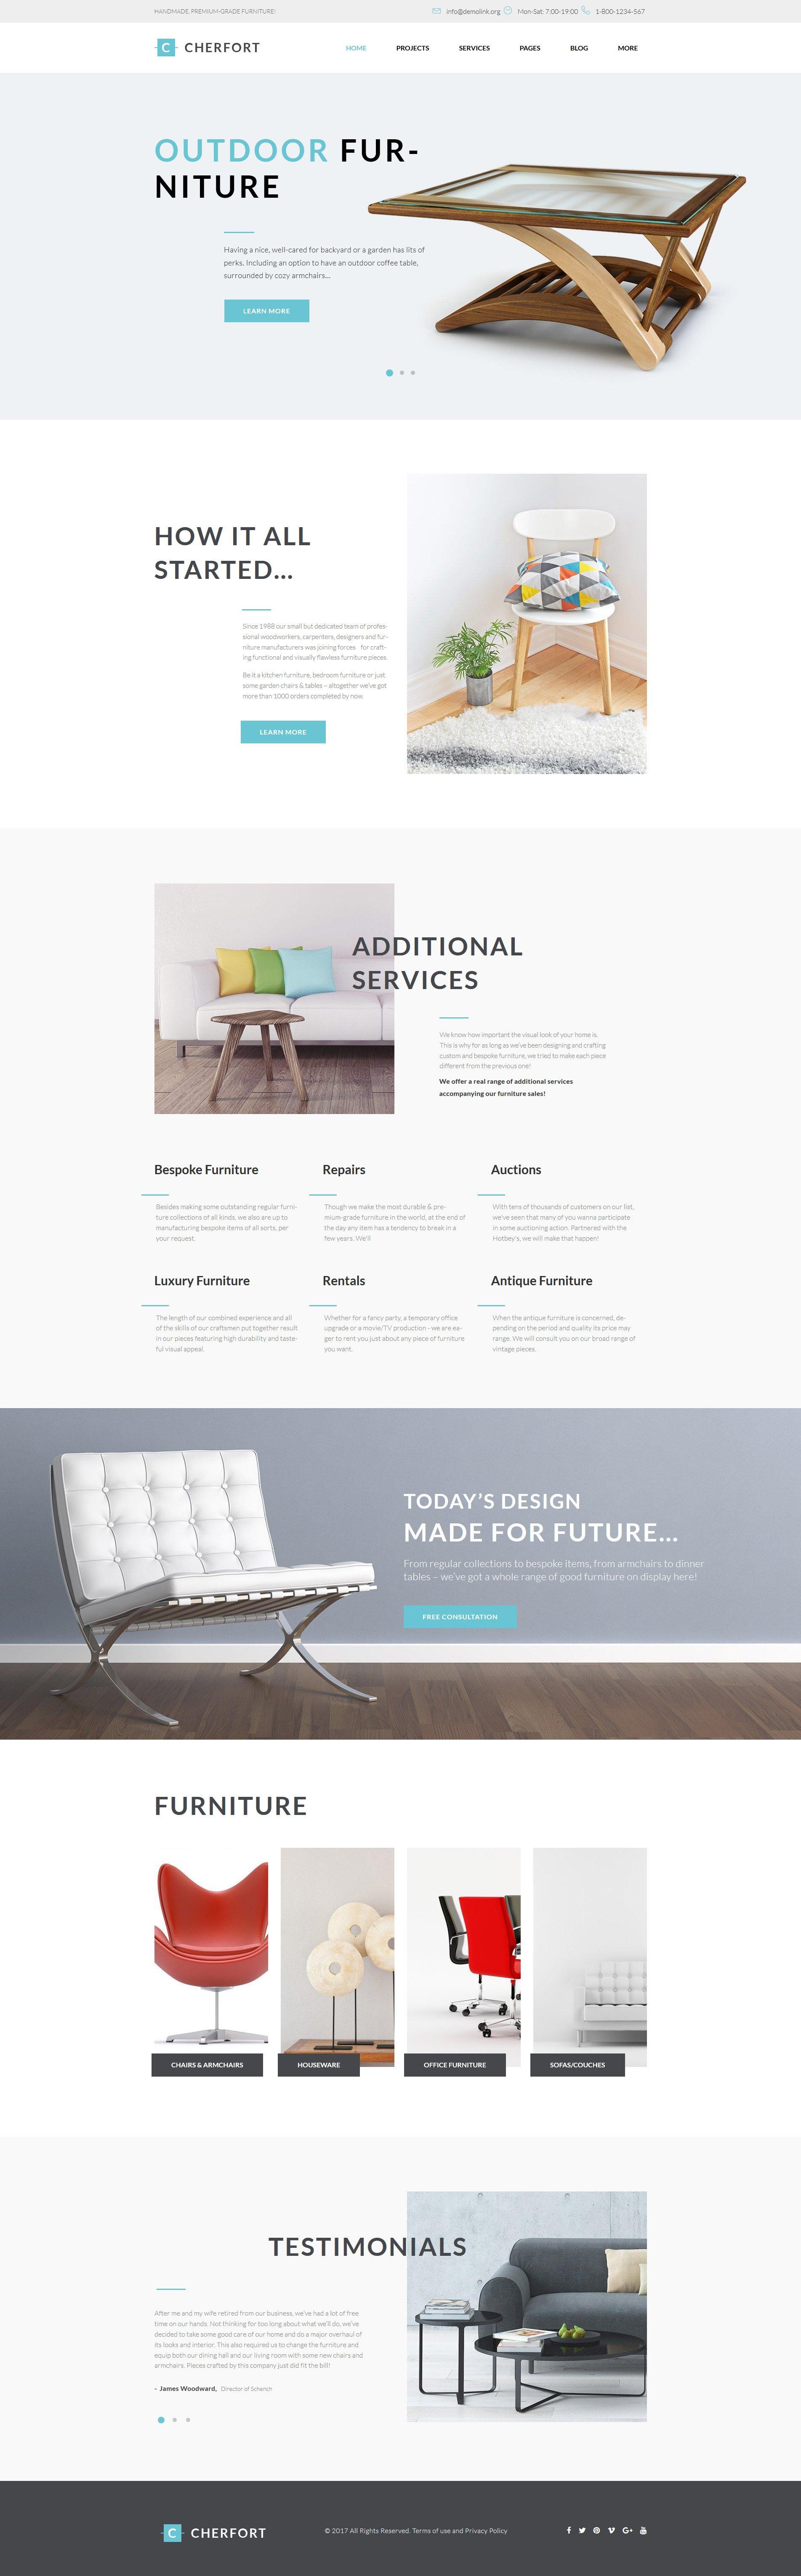 Cherfort - Furniture Company Responsive №64097 - скриншот